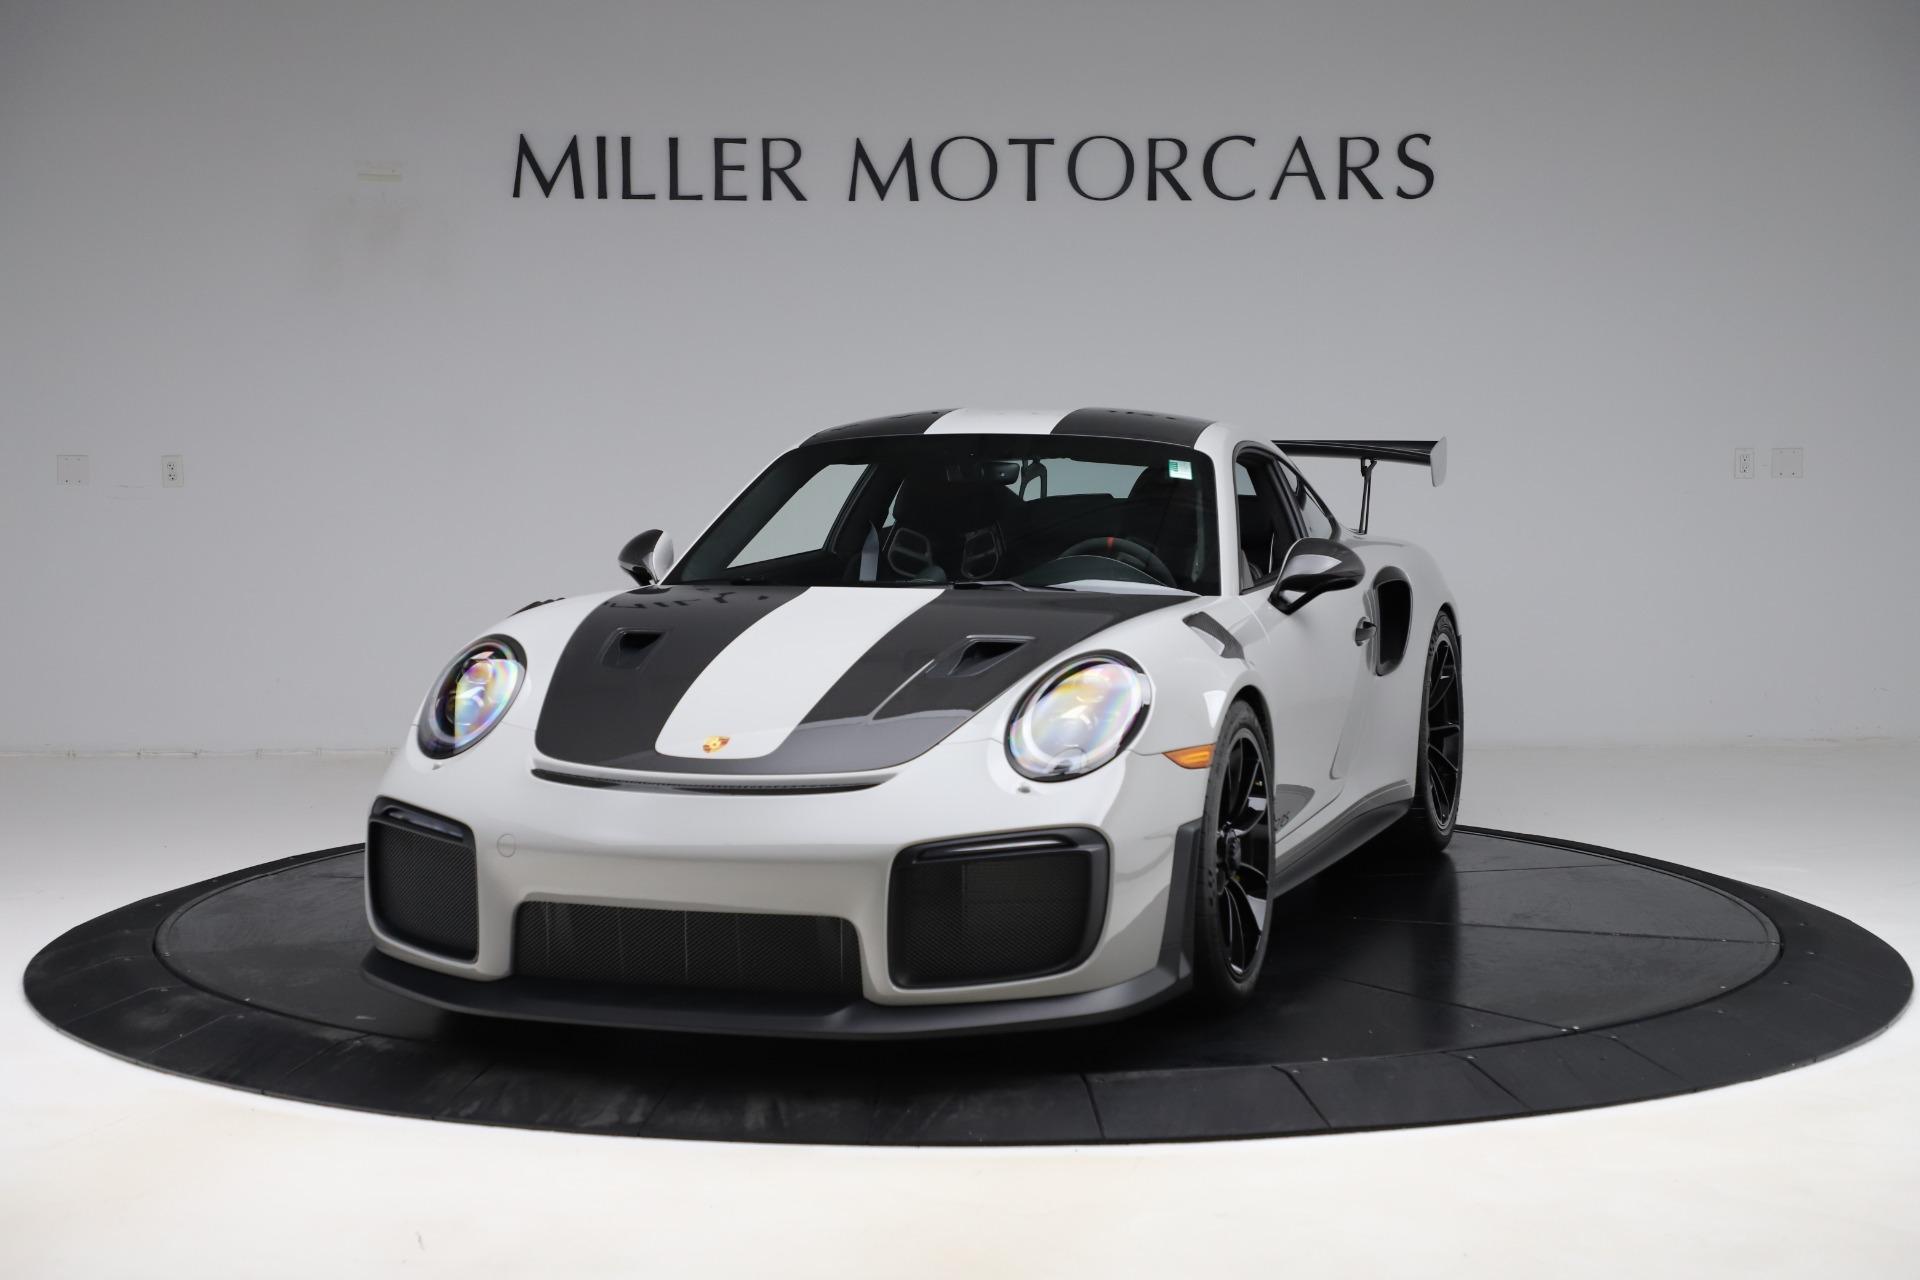 Used 2018 Porsche 911 GT2 RS for sale $349,900 at Alfa Romeo of Westport in Westport CT 06880 1